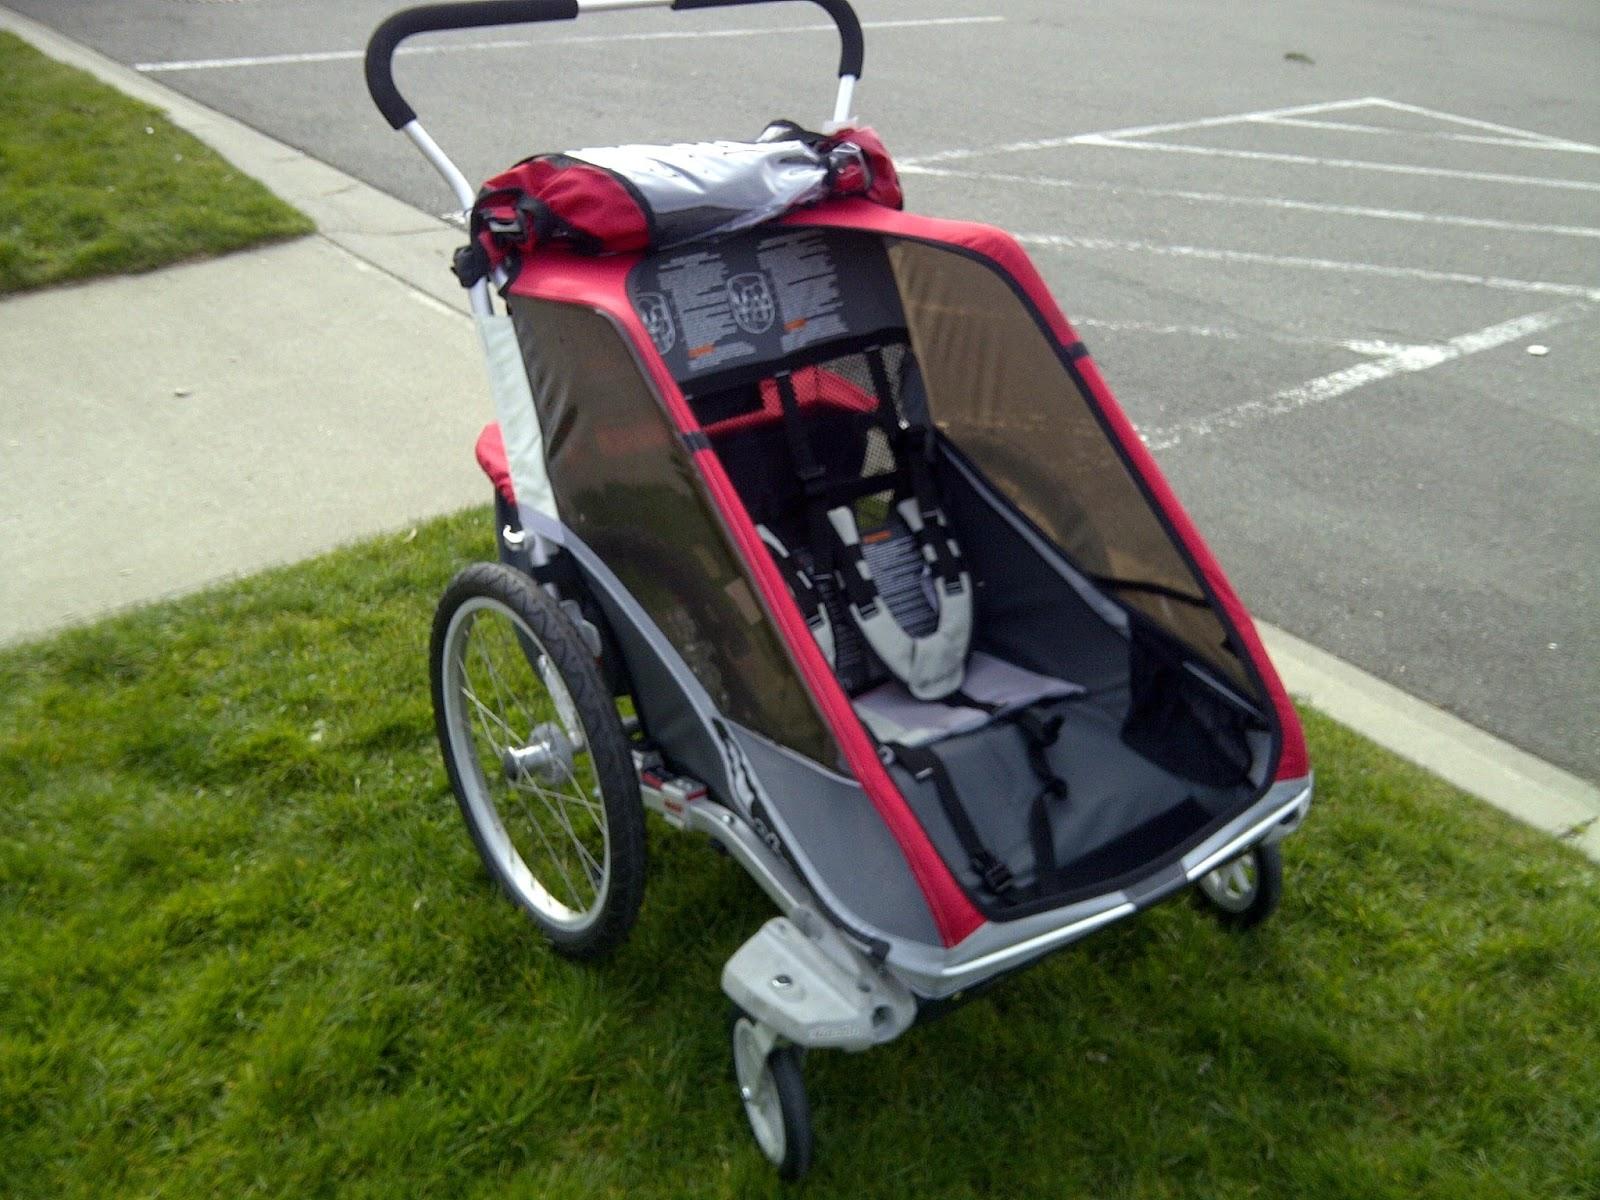 BAM Gear Chariot Cougar 2 Stroller Bike Trailer